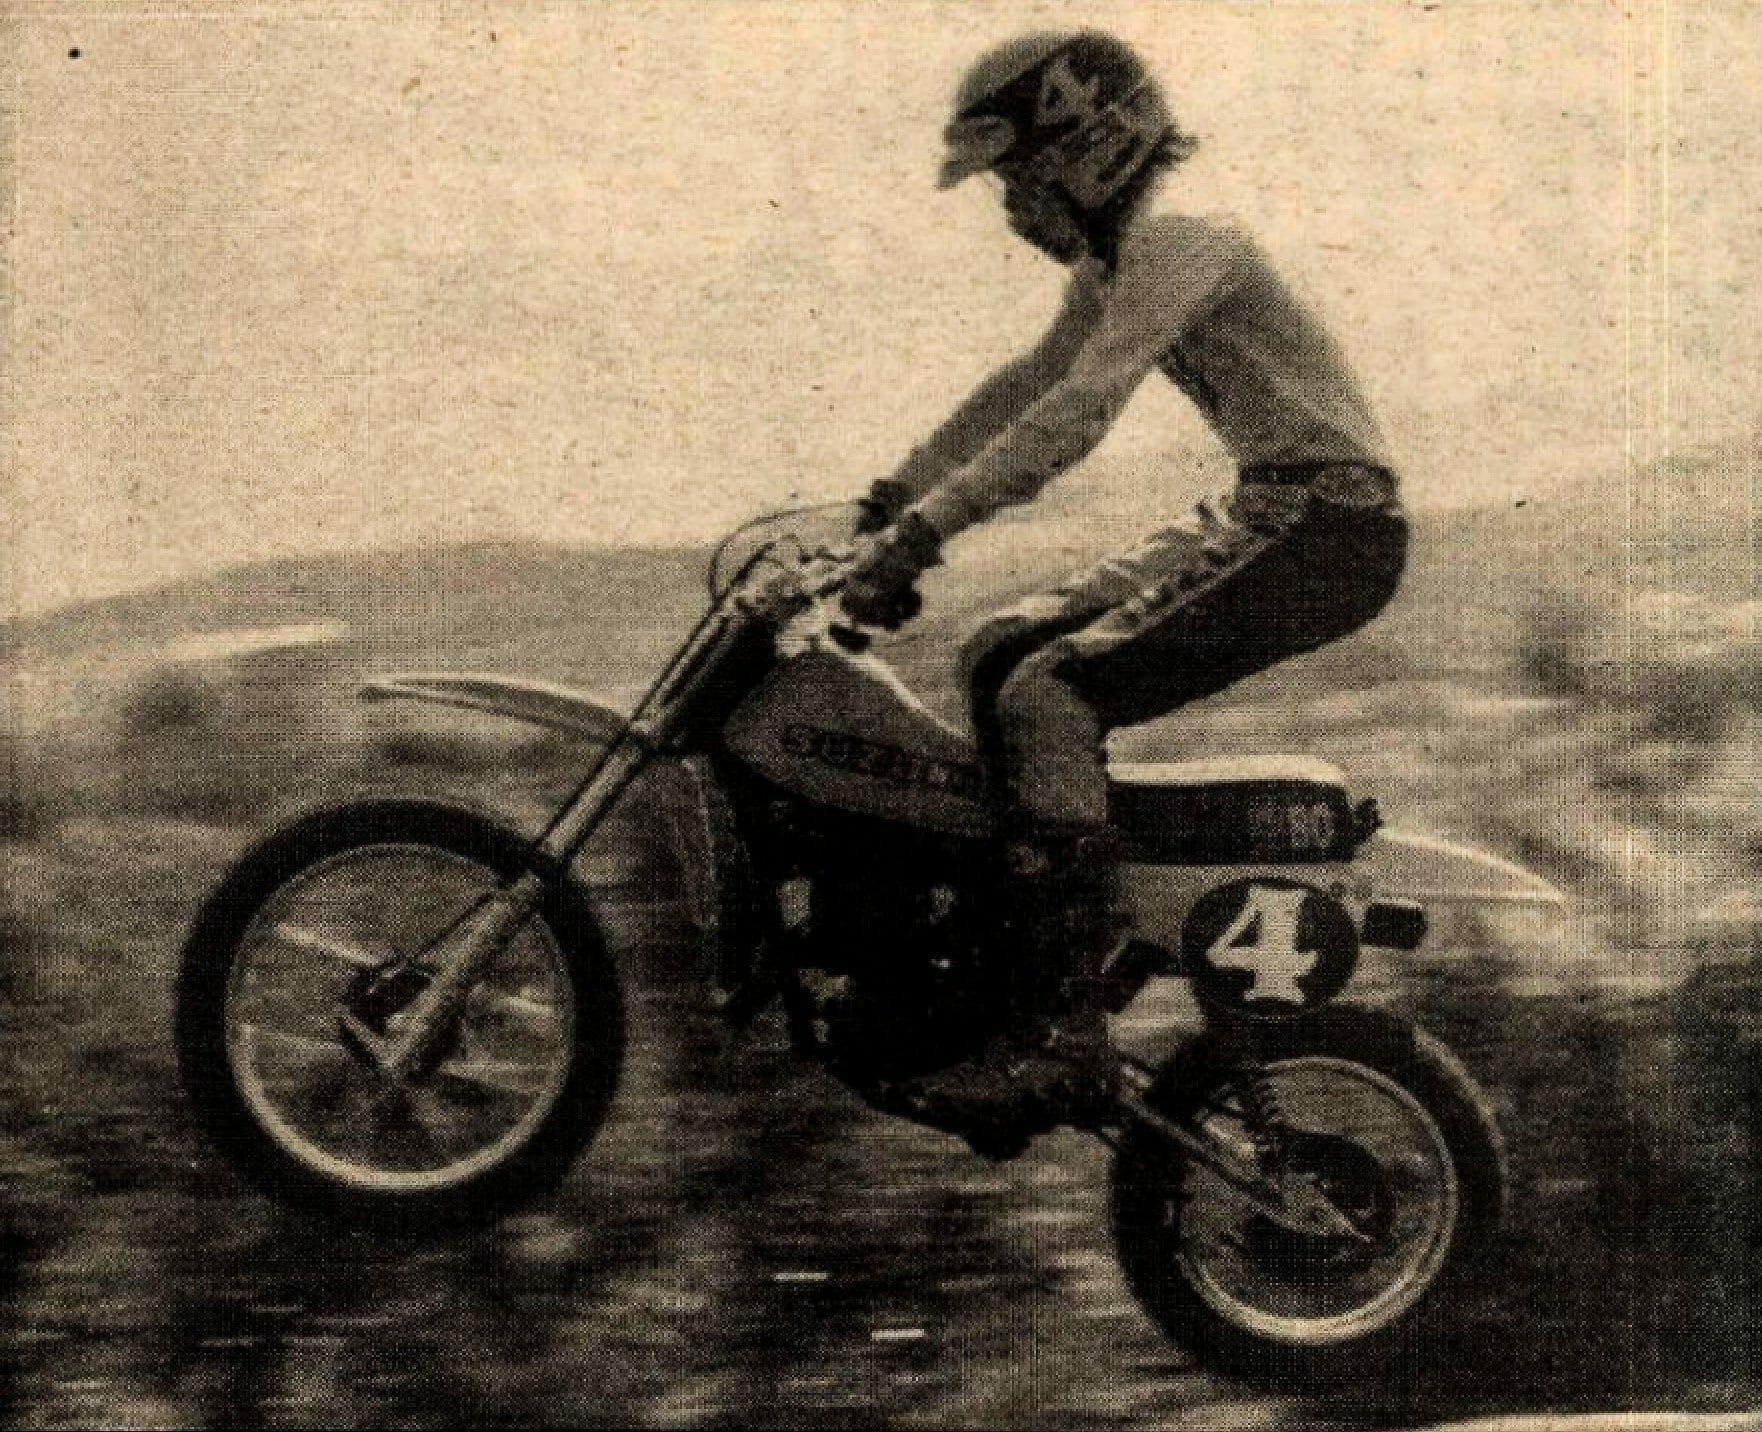 Ronnie Lechien 1979, Barona Oaks Raceway